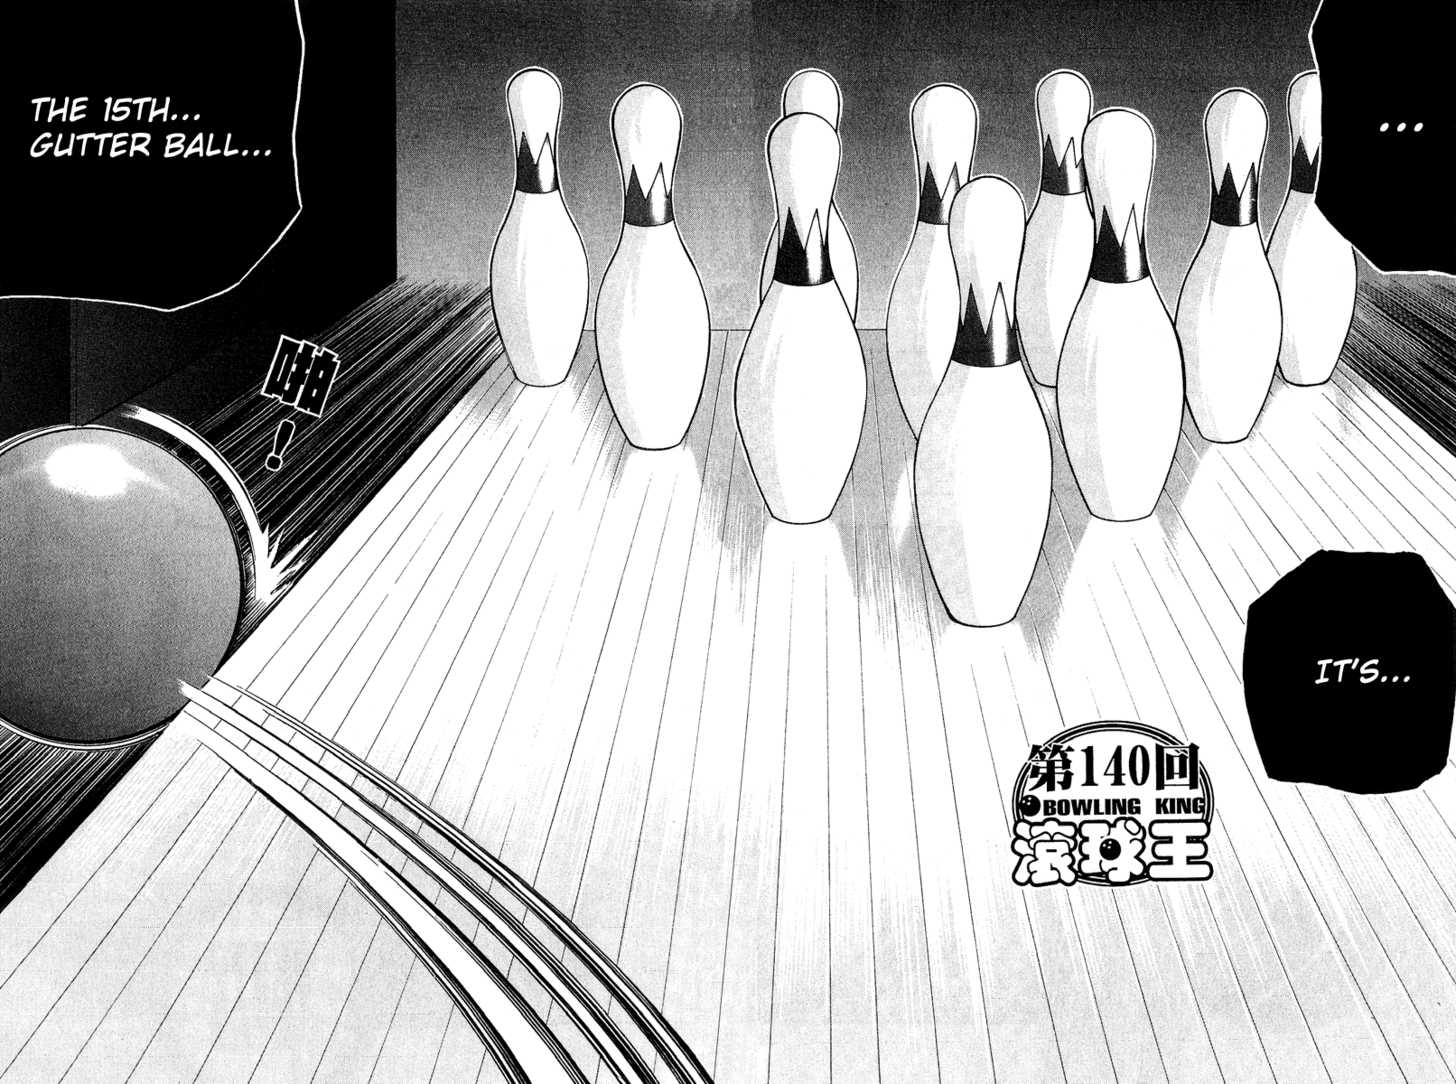 Bowling King 140 Page 2